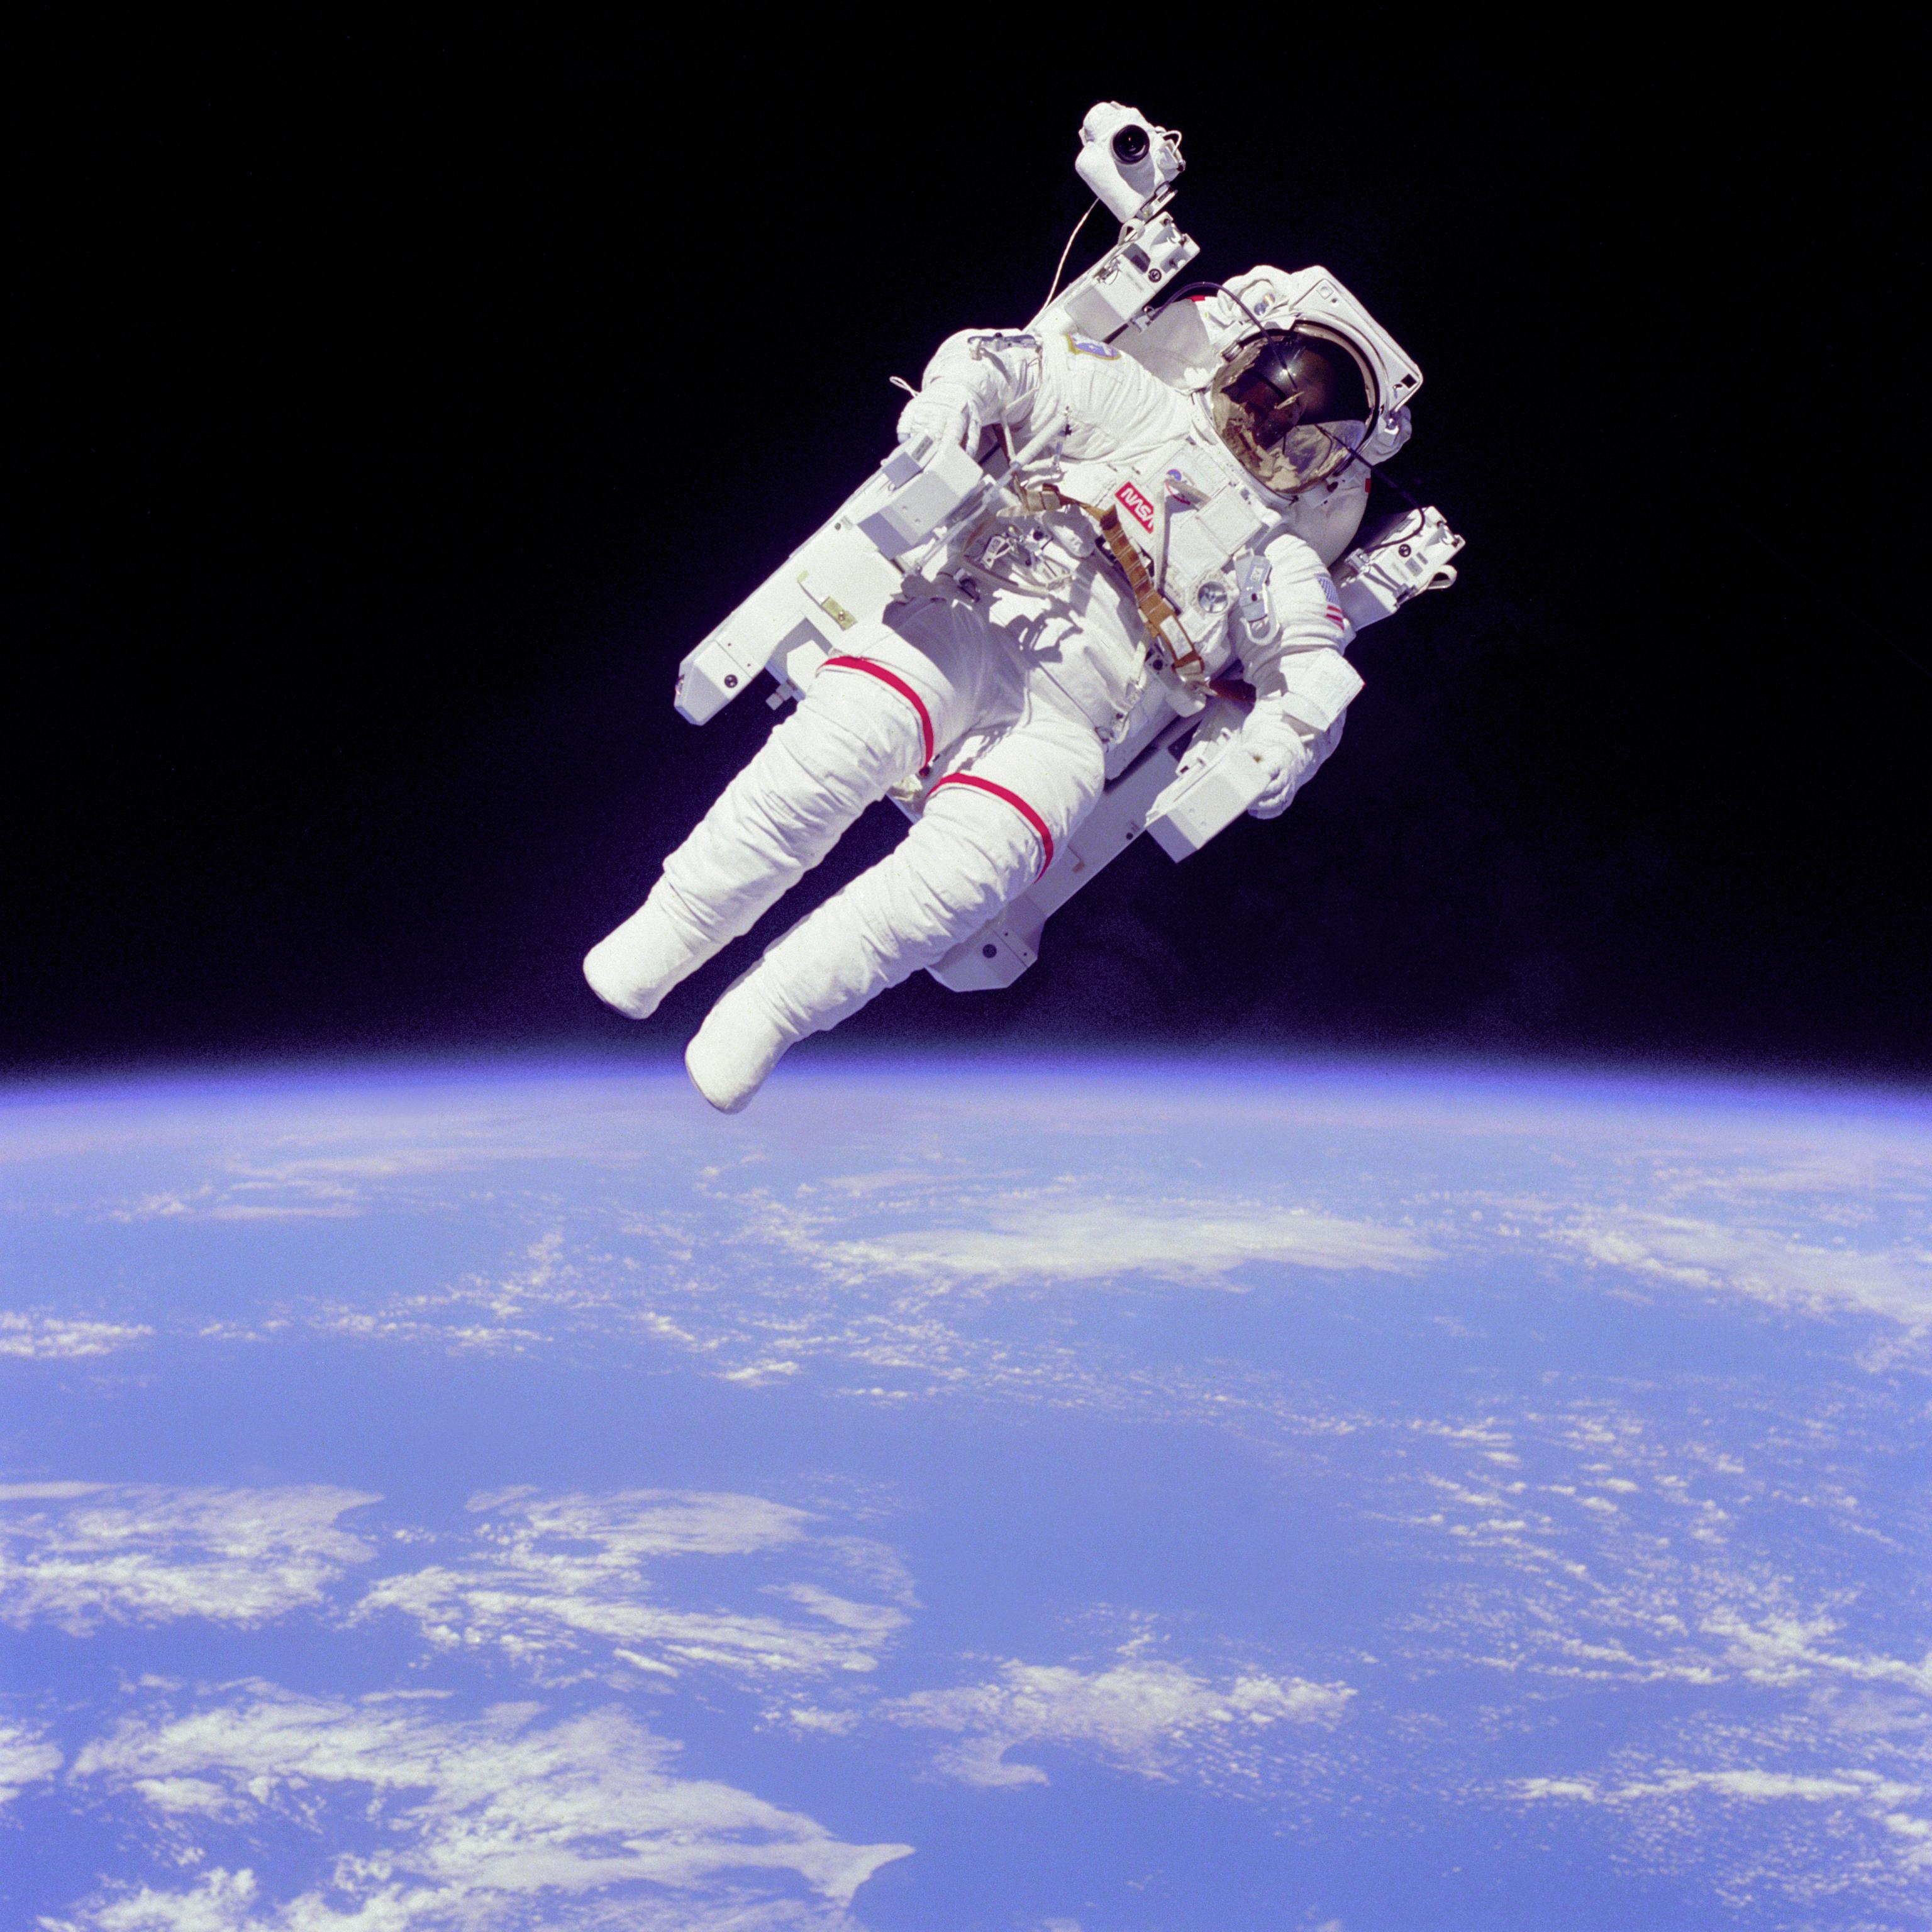 File:Astronaut-EVA.jpg - Wikipedia